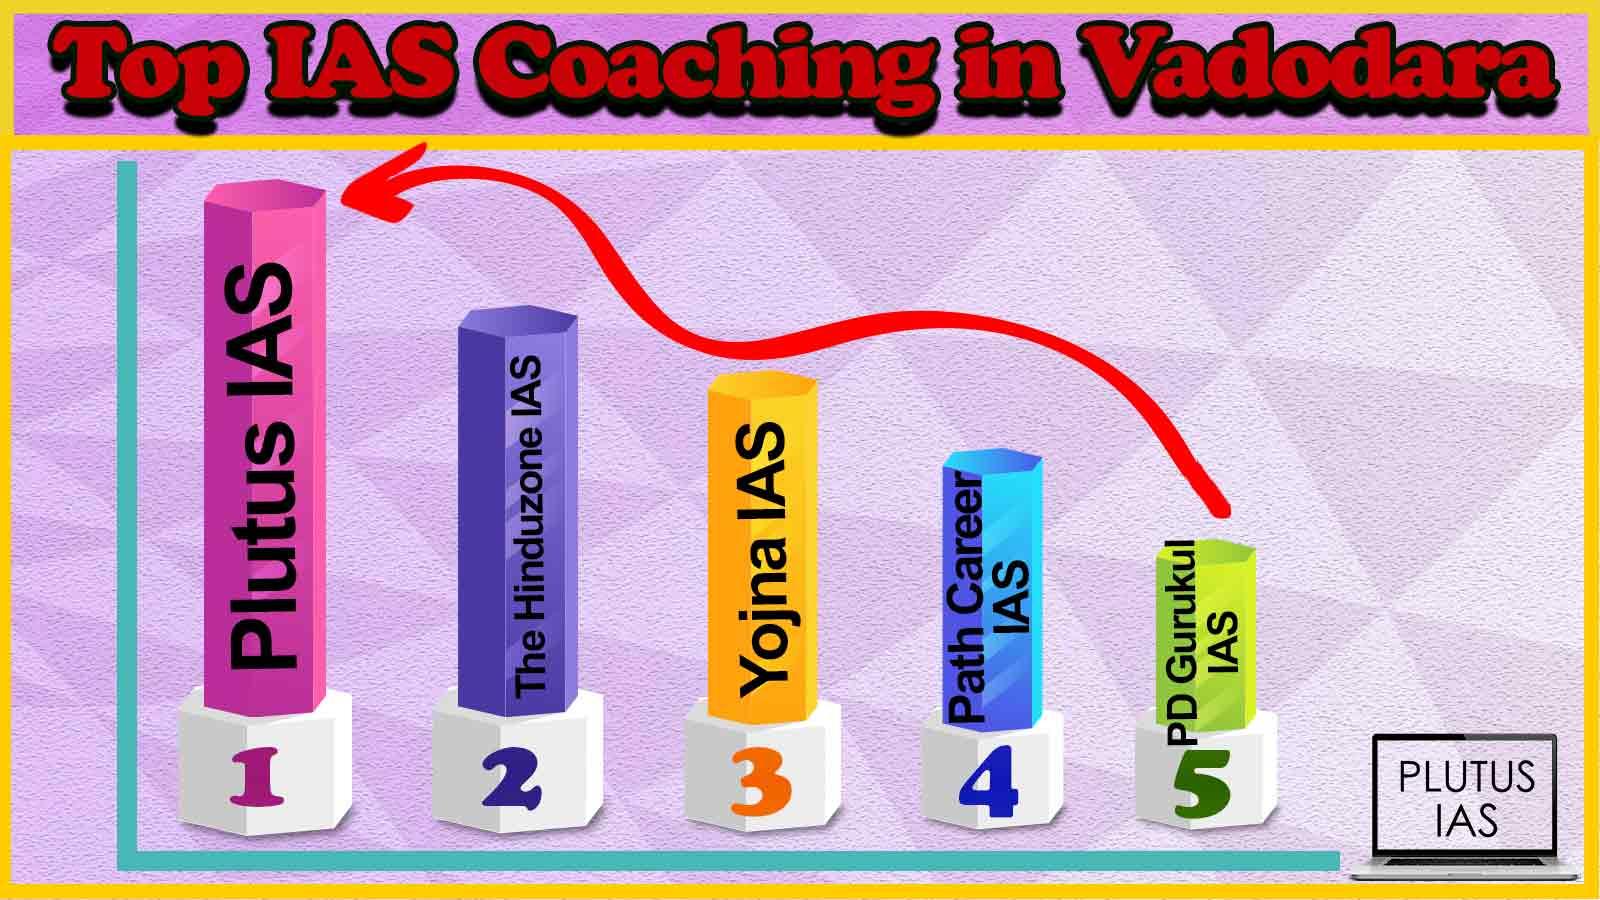 Top 10 IAS Coaching in Vadodara